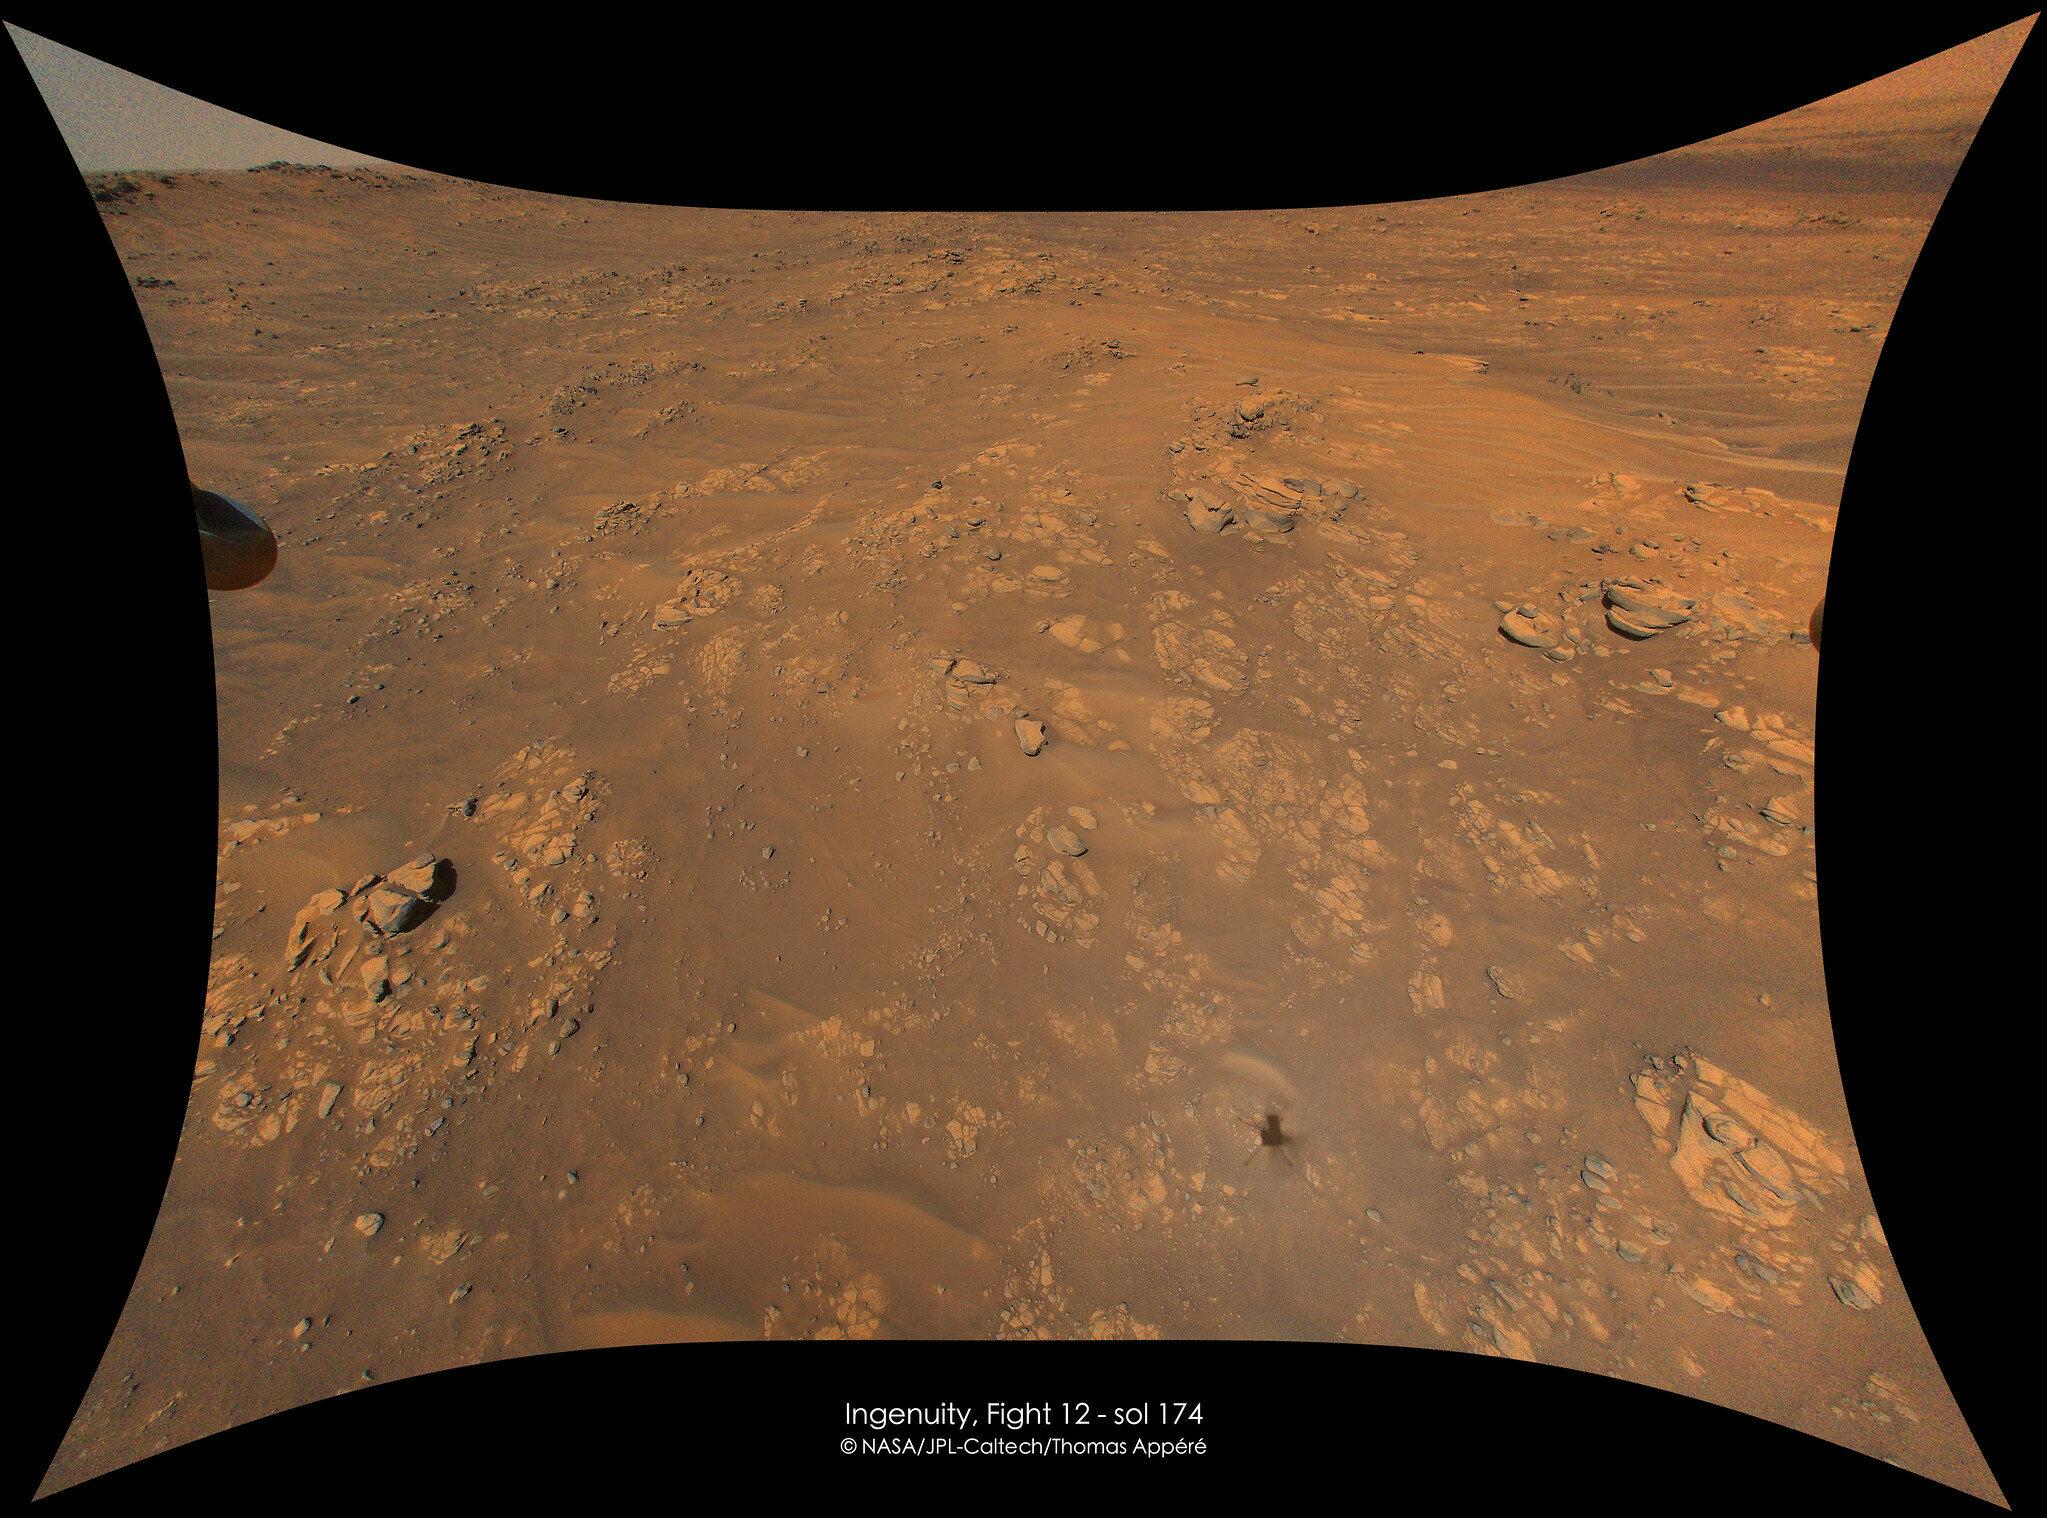 Mars 2020 (Perseverance - Ingenuity) : exploration du cratère Jezero - Page 21 12131